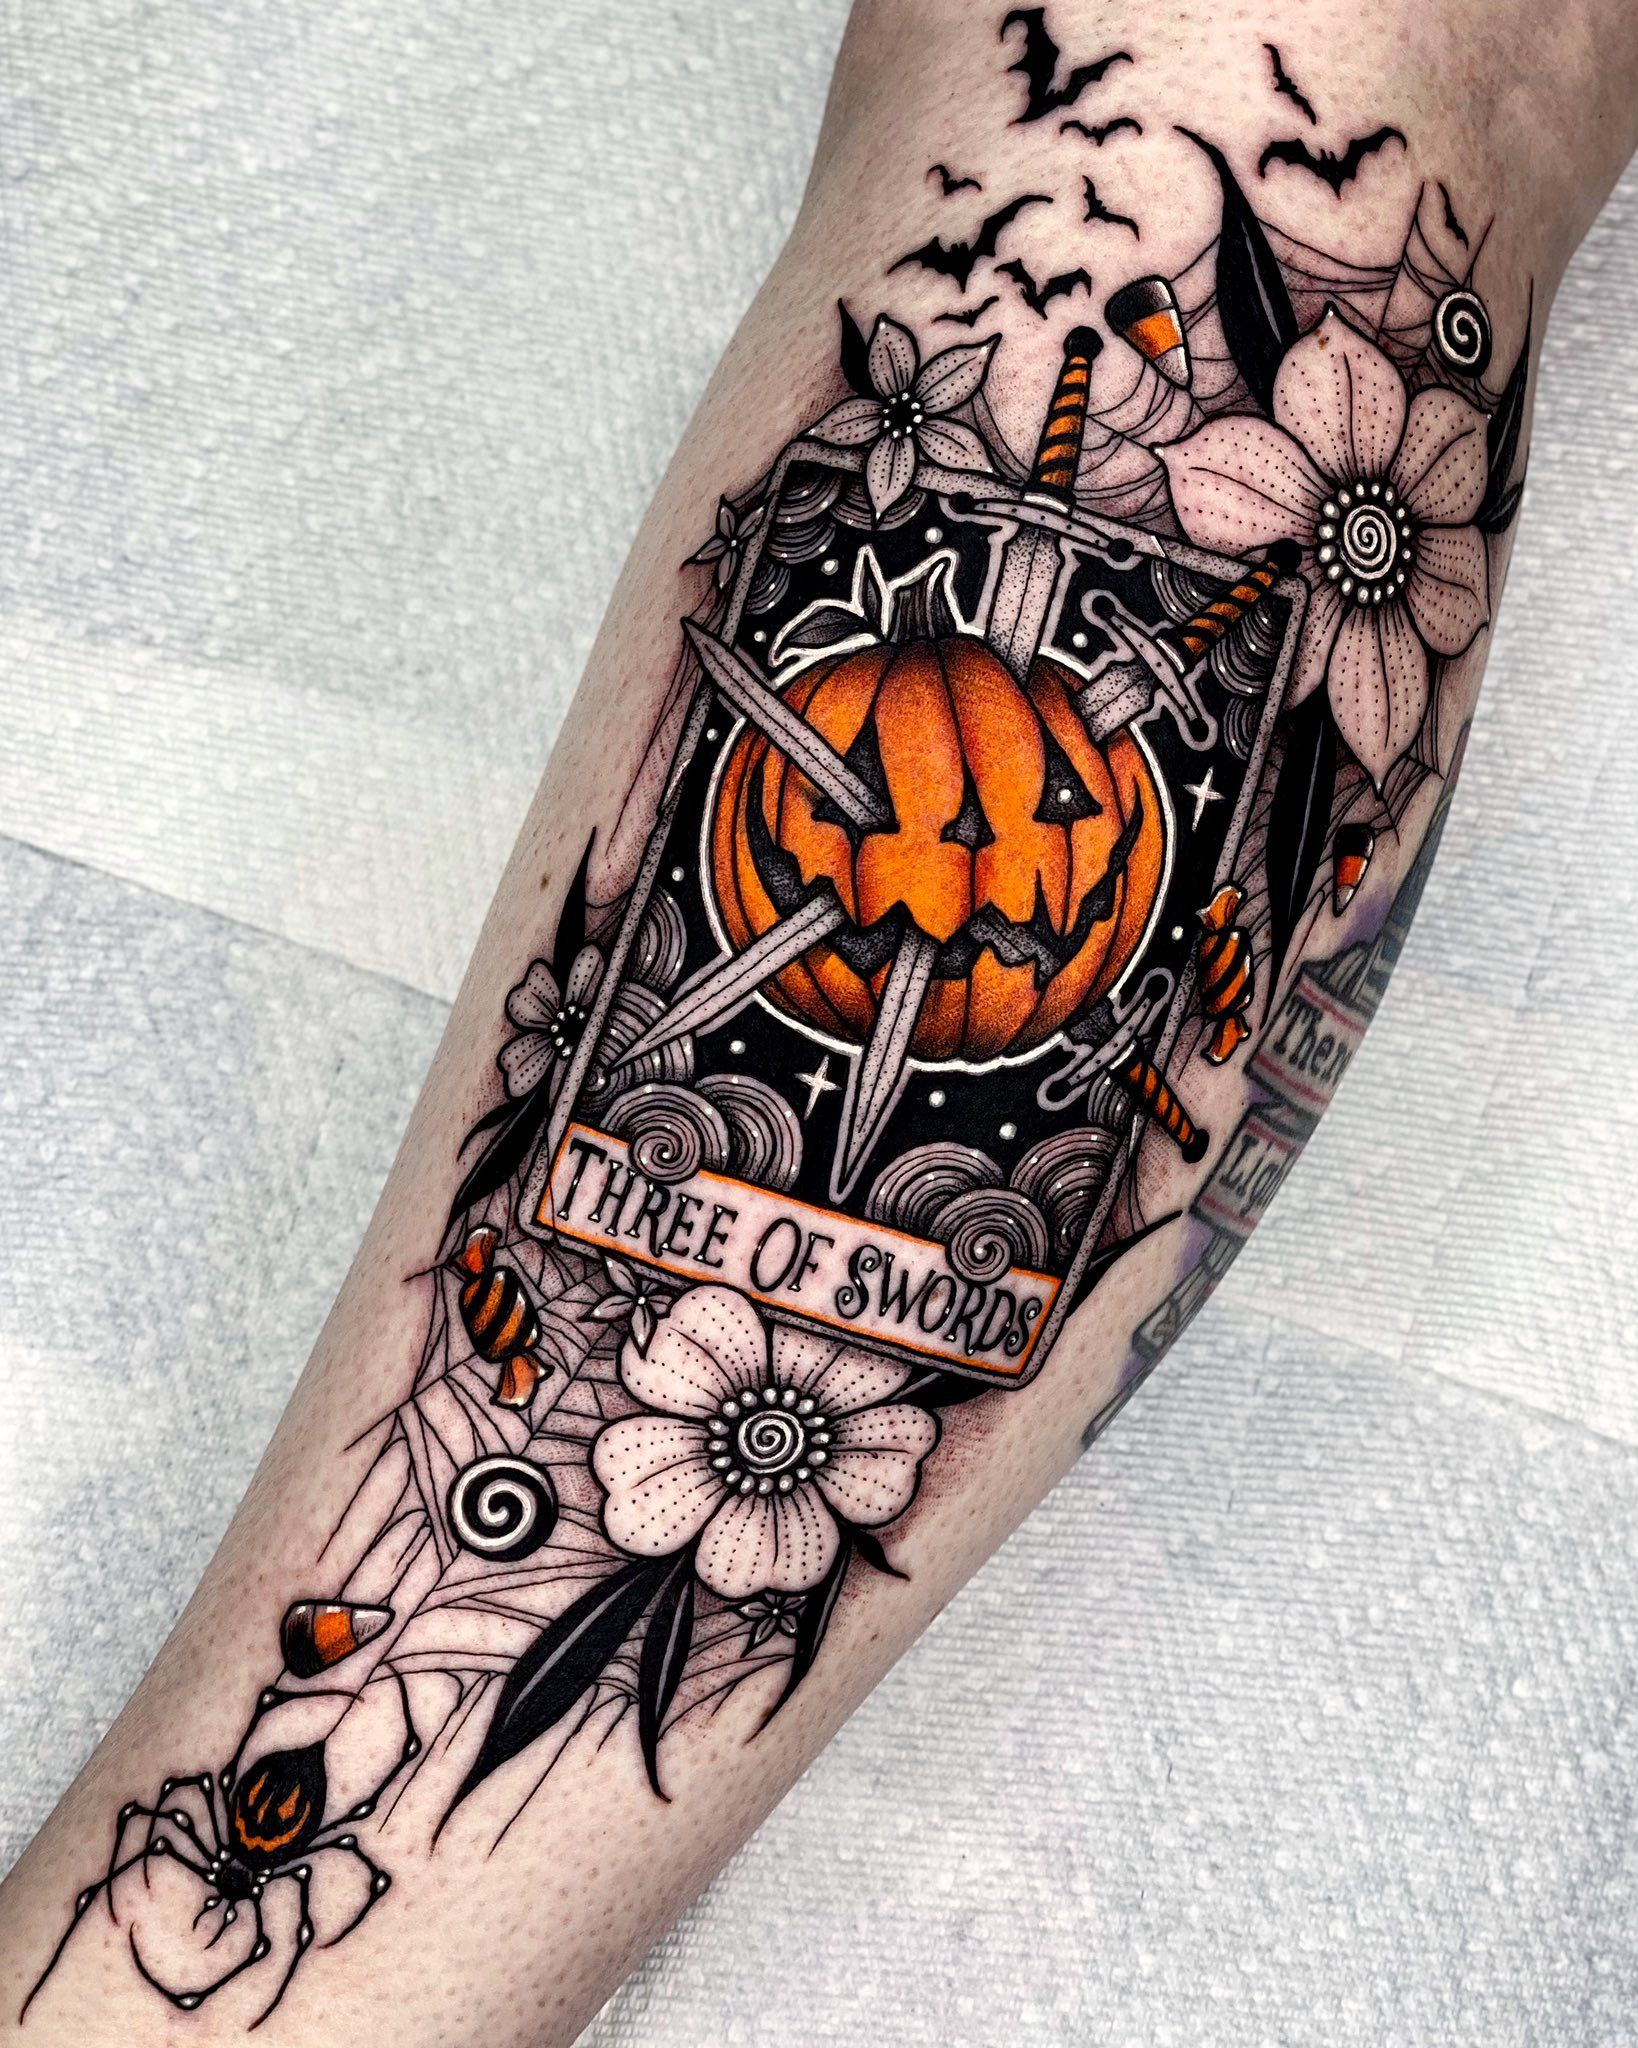 Halloween Tattoos.Angelo Parente On Twitter In 2021 Halloween Tattoos Tarot Tattoo Halloween Tattoos Sleeve